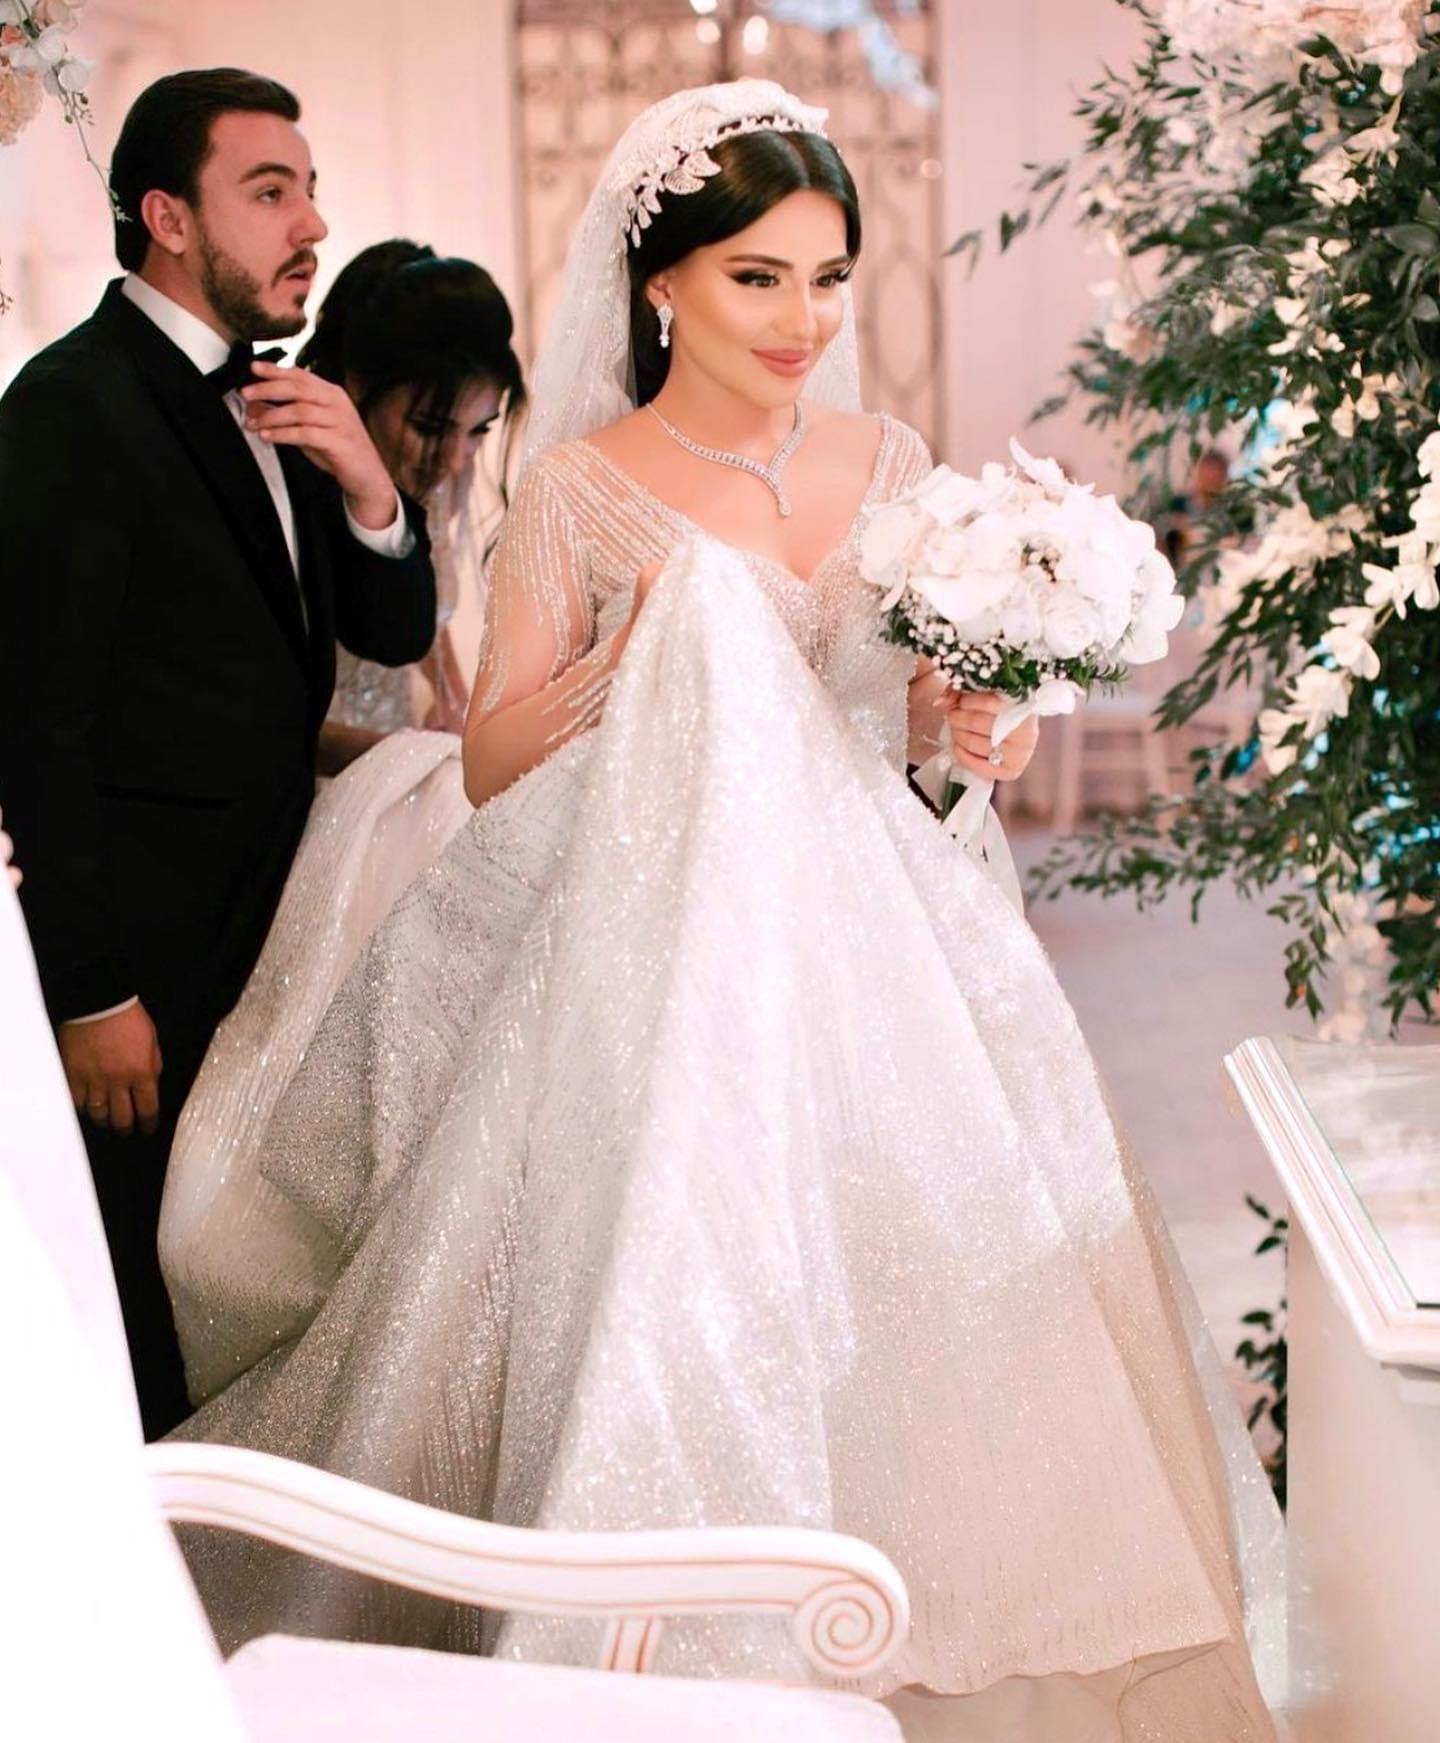 Pin By Paloma Barragan On Wedding Dress In 2021 Dresses Wedding Dresses Wedding Dresses Lace